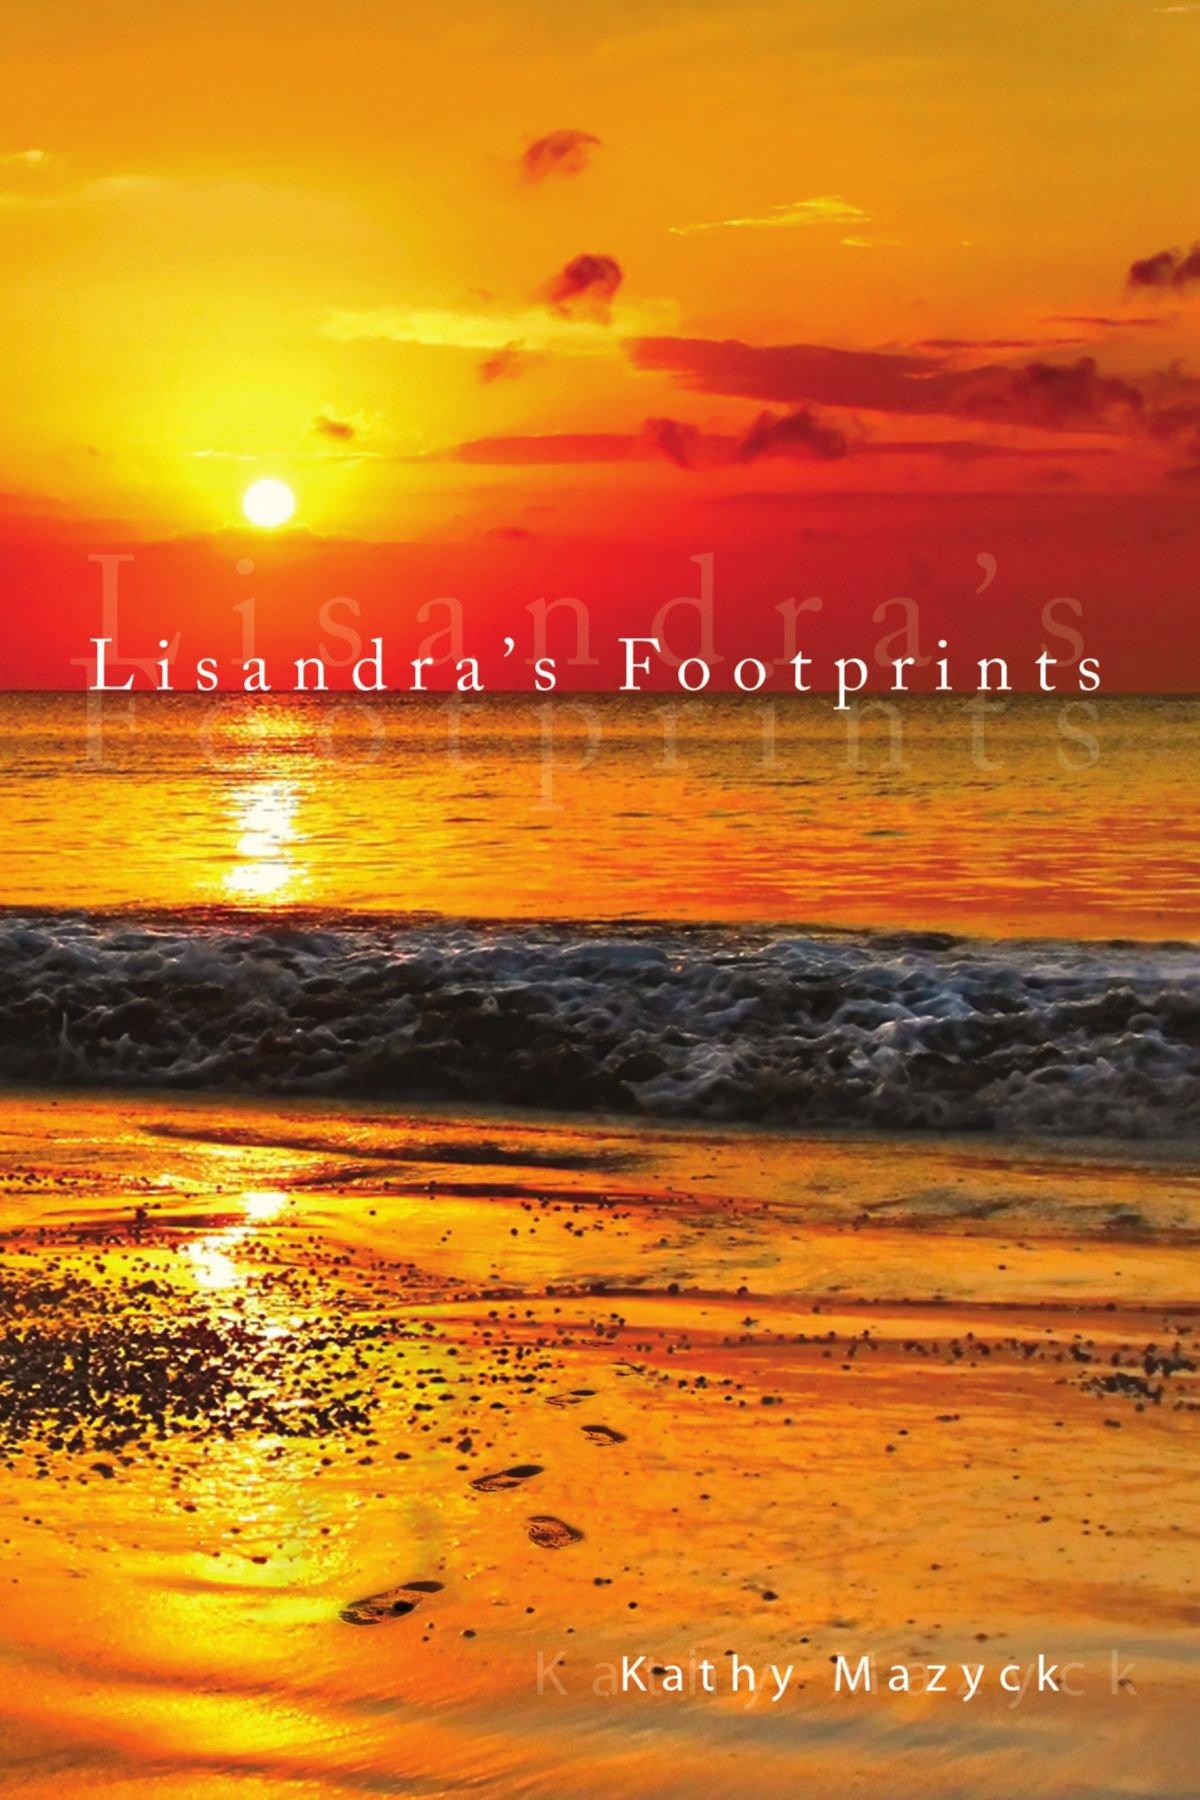 Lisandra's Footprints